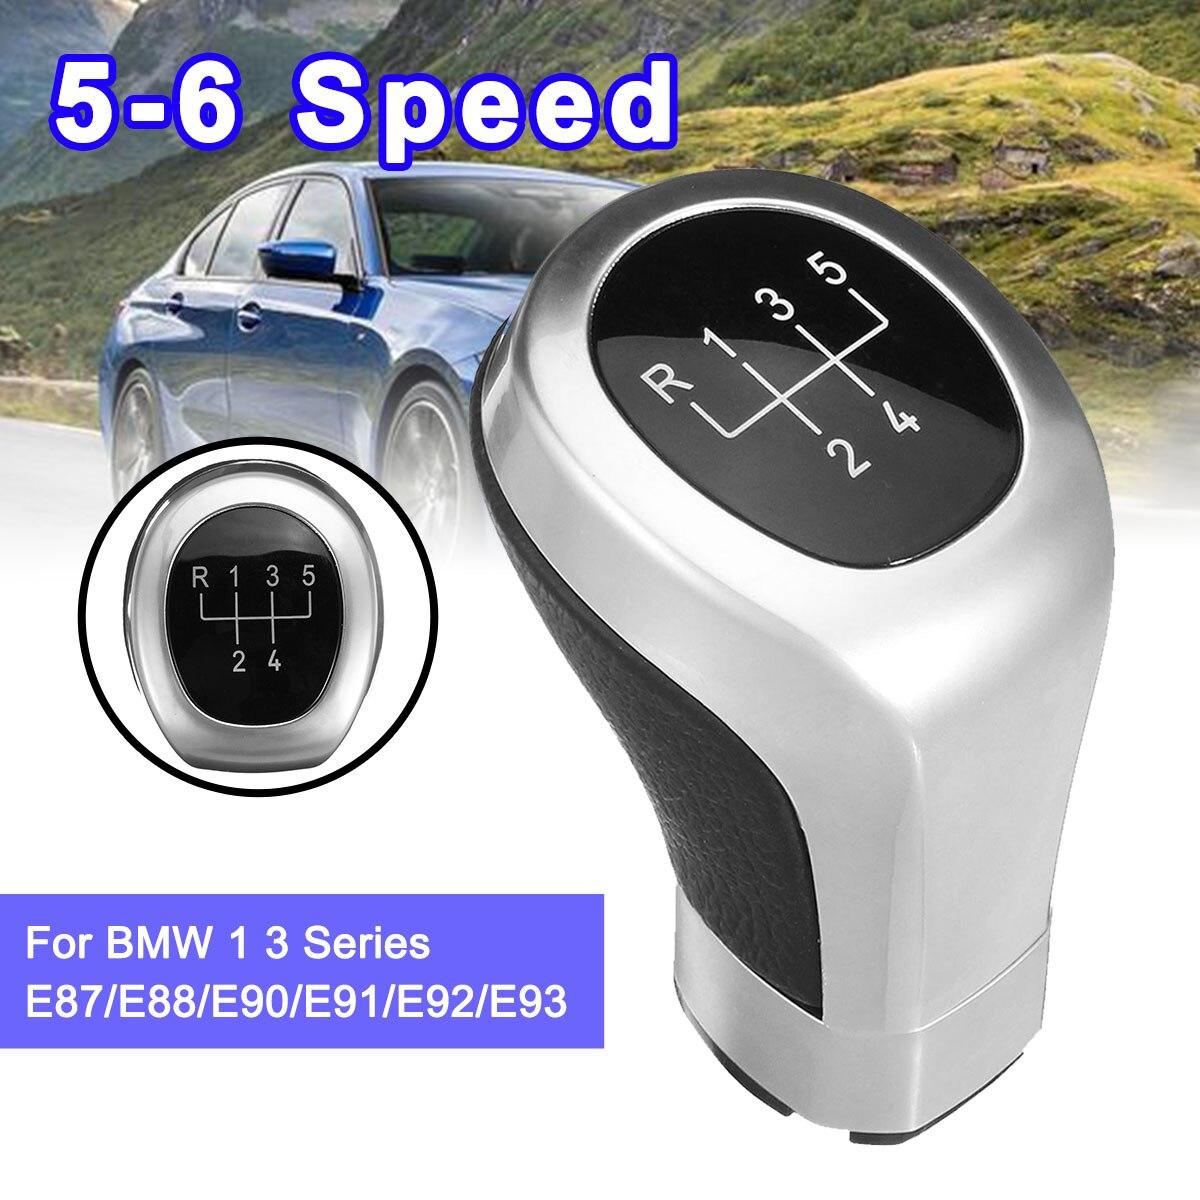 Car 5 6 Speed Gear Shift Knob Shifter Lever Knob Head Replace For BMW 1 3 series E81 E87 E88 E82 E90 E91 E92 E93 2005-2011